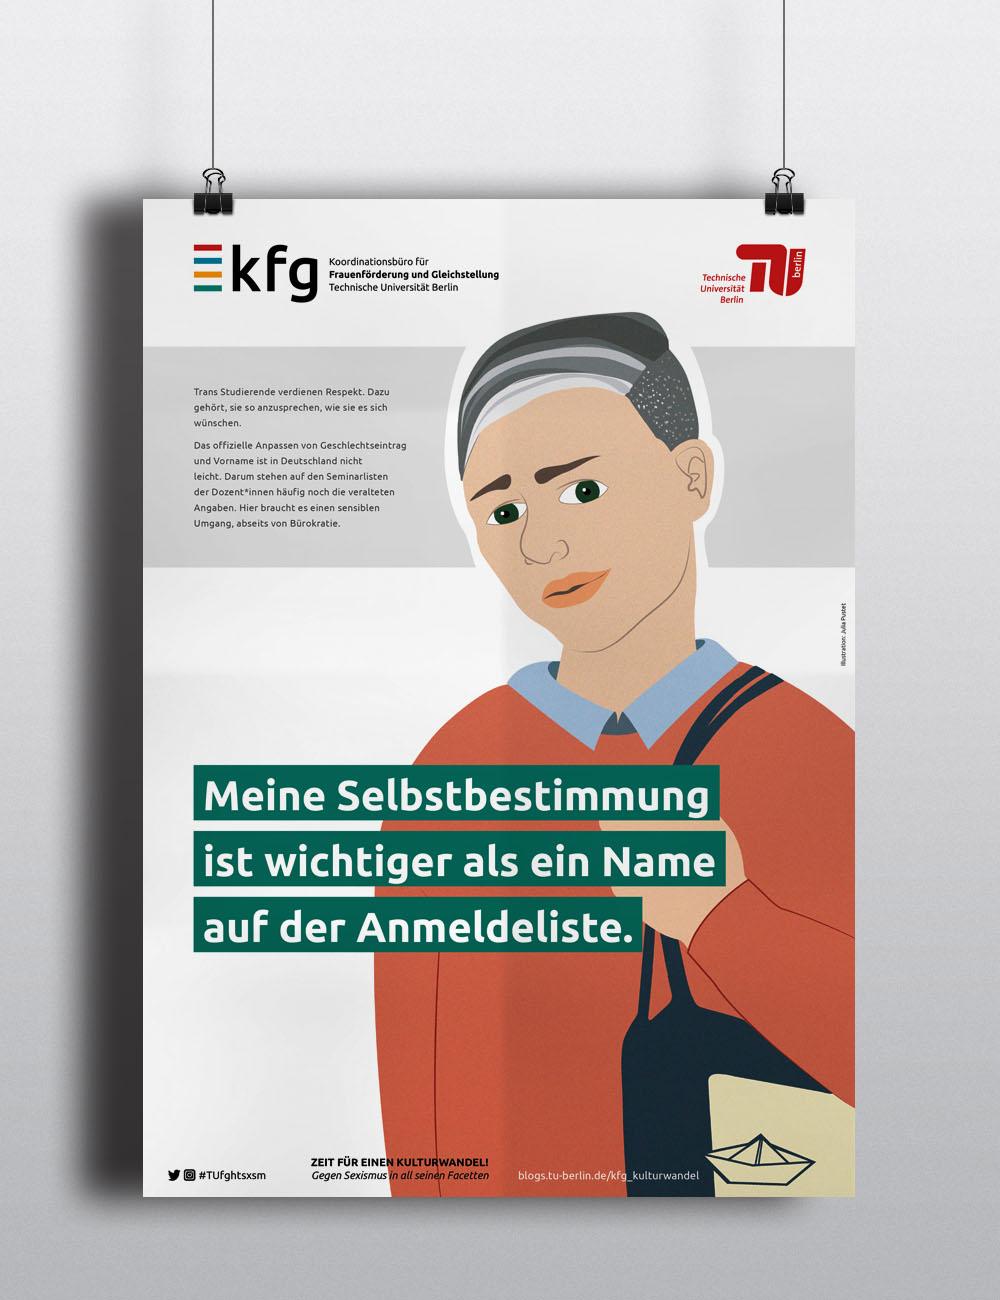 Poster_KFG_Antisexismus-Kampagne_TUBerlin_02